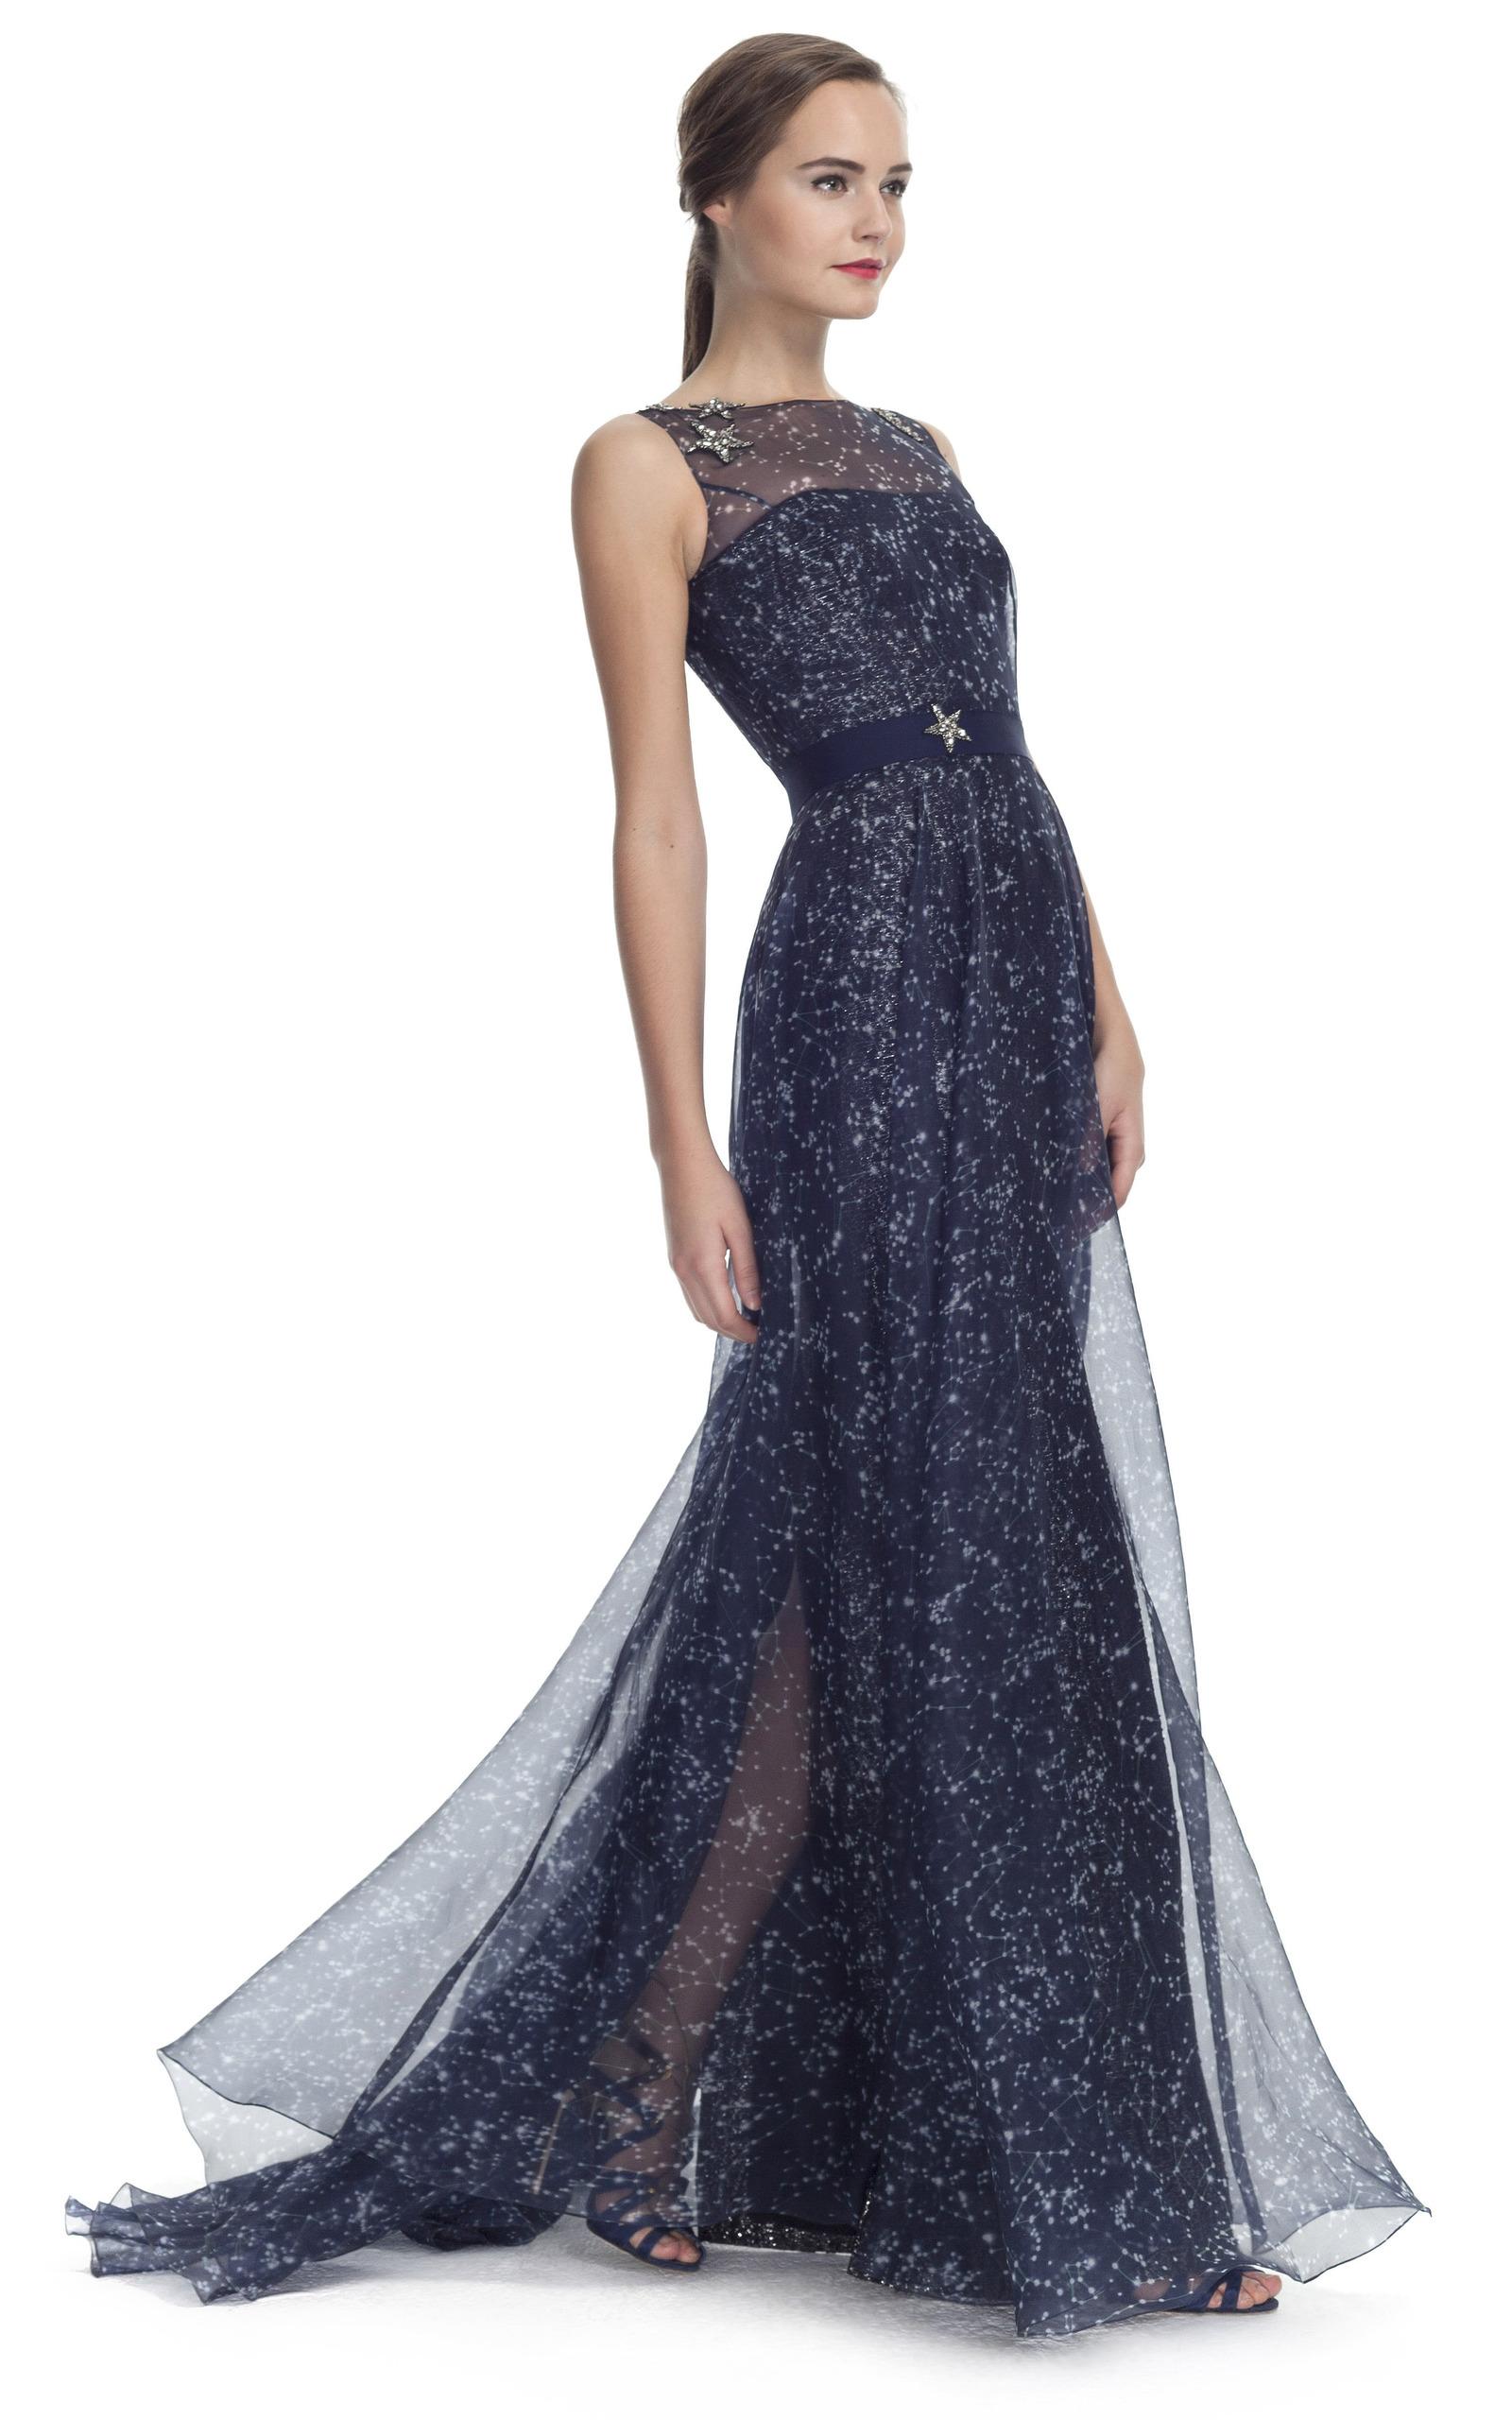 d86b085eeb469 Carolina HerreraConstellation Organza Sleeveless Gown. CLOSE. Loading